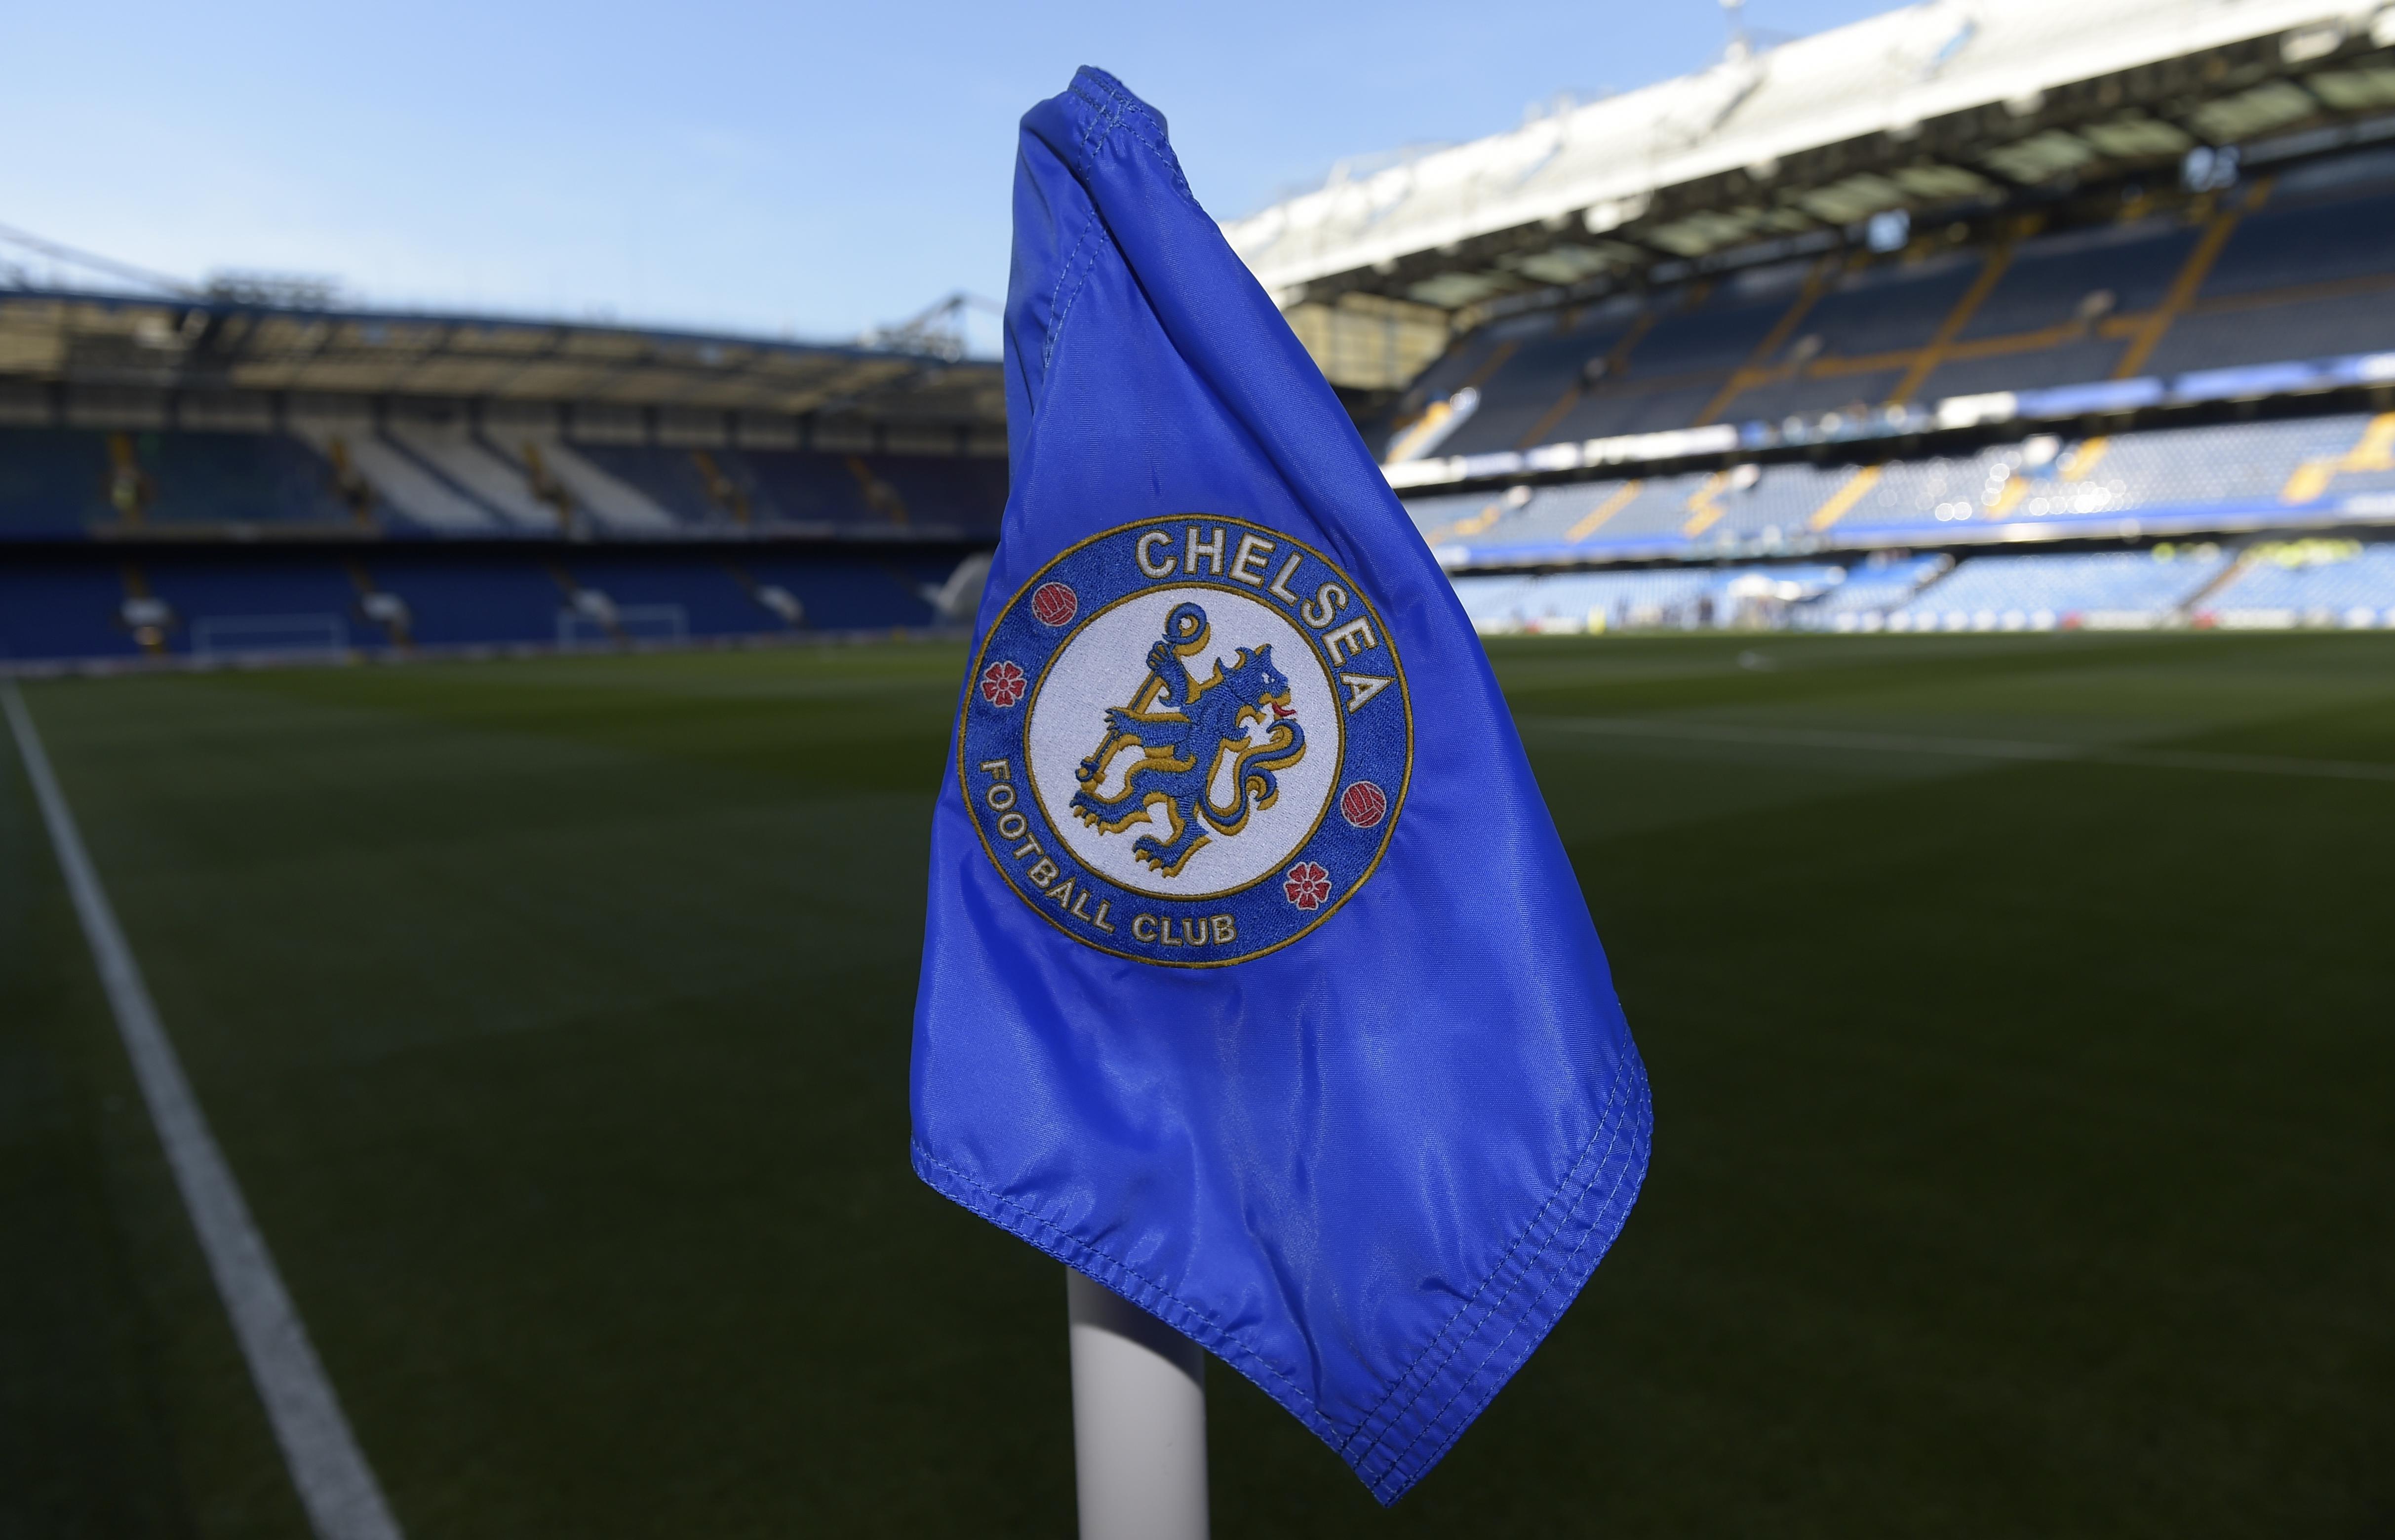 Chelsea vs. Liverpool predicted lineup: Will David Luiz return to starting XI?